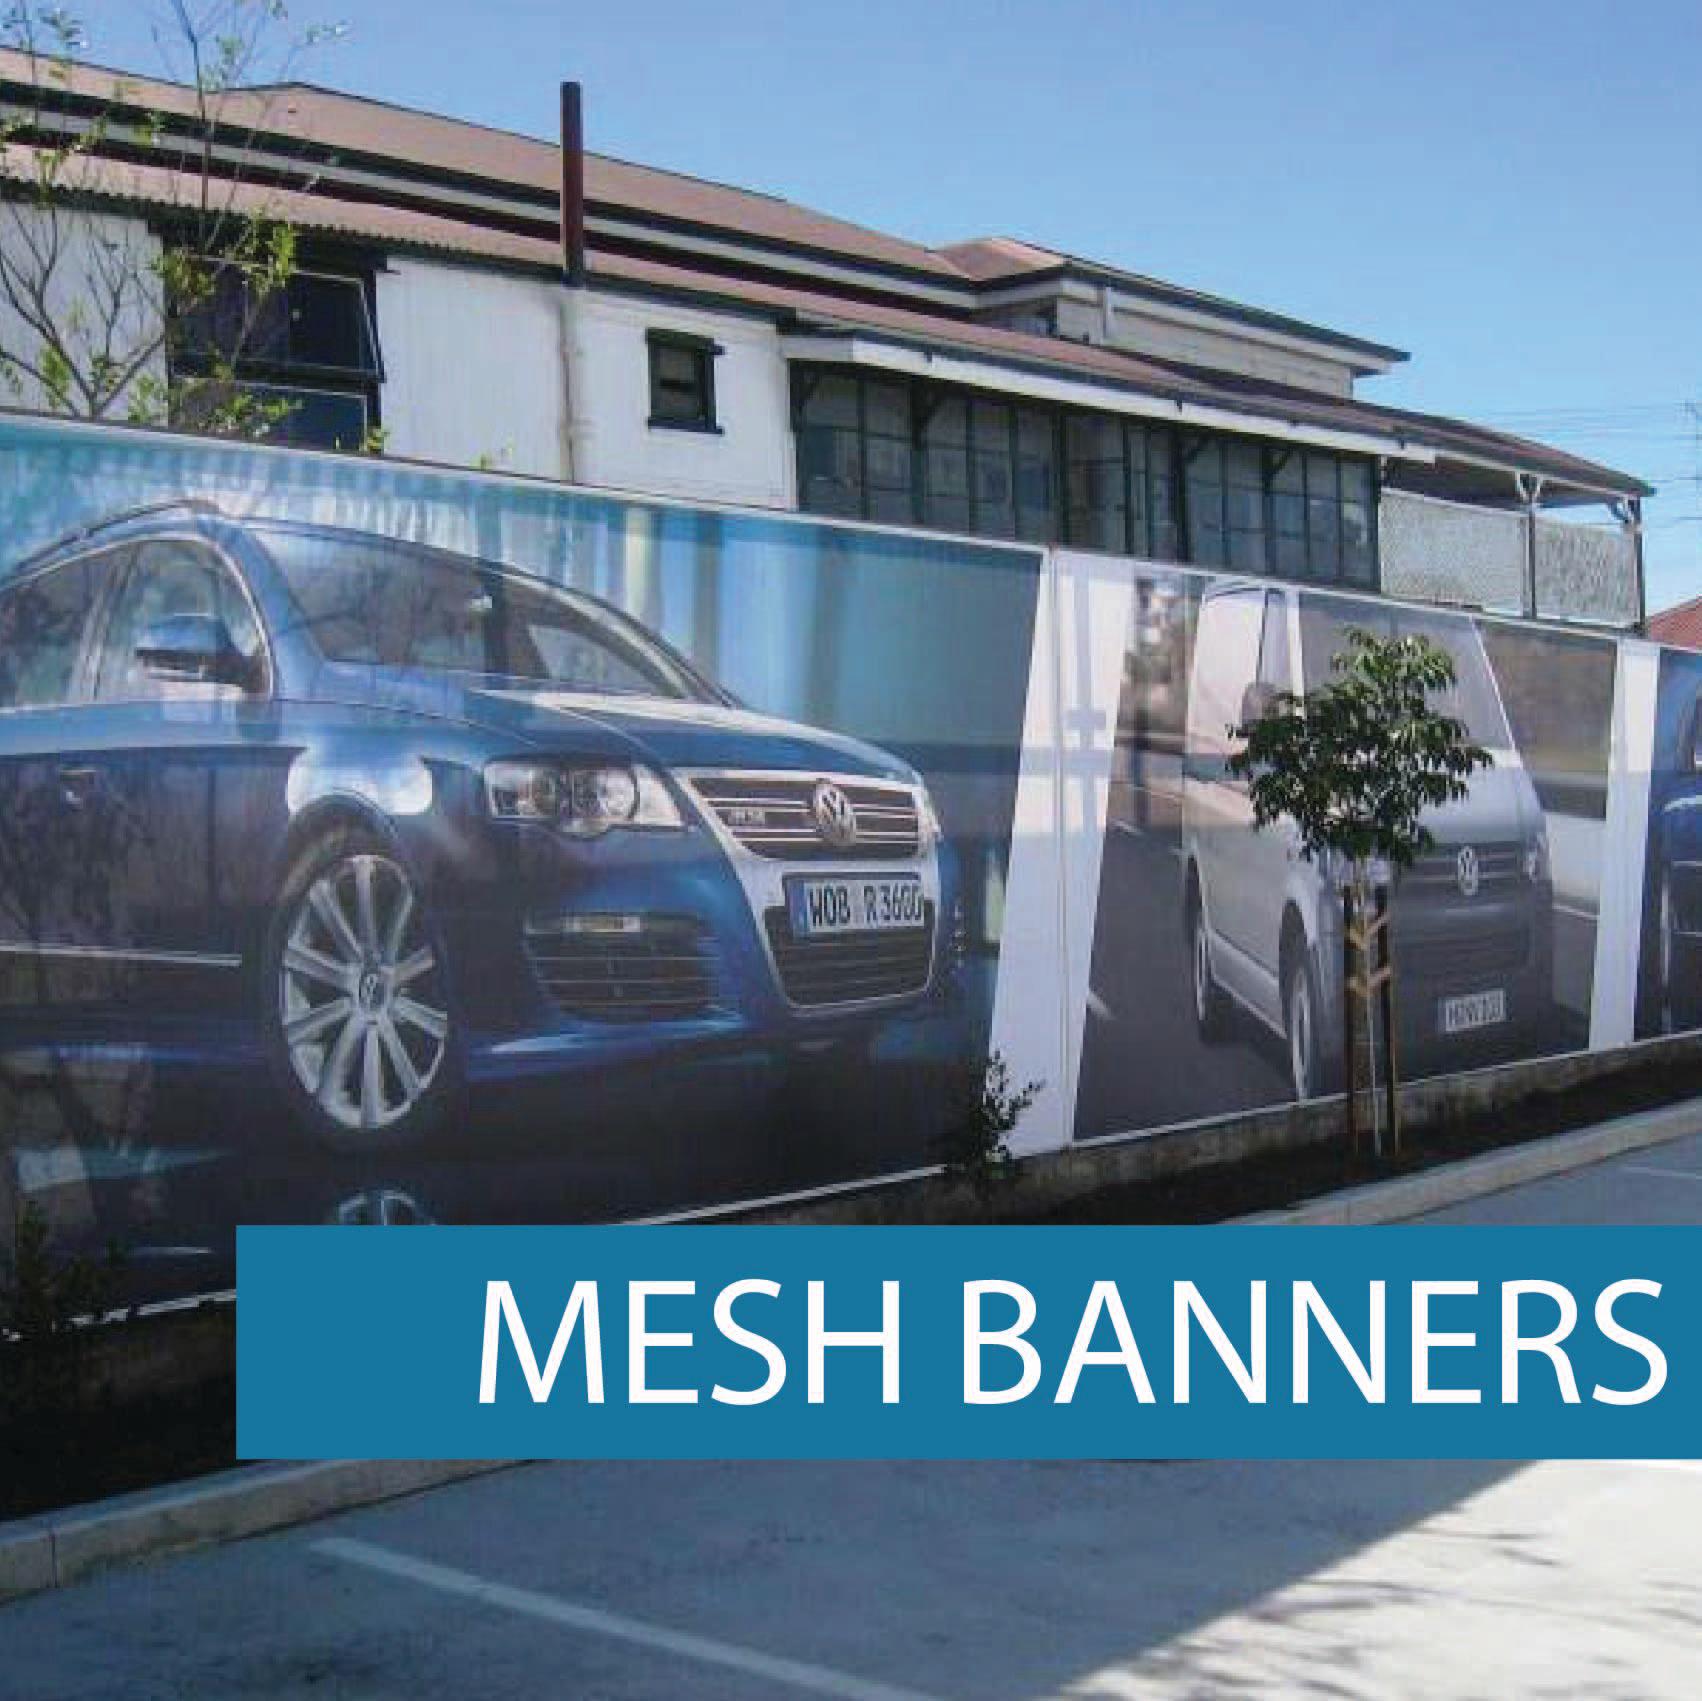 Advertising mesh Banner